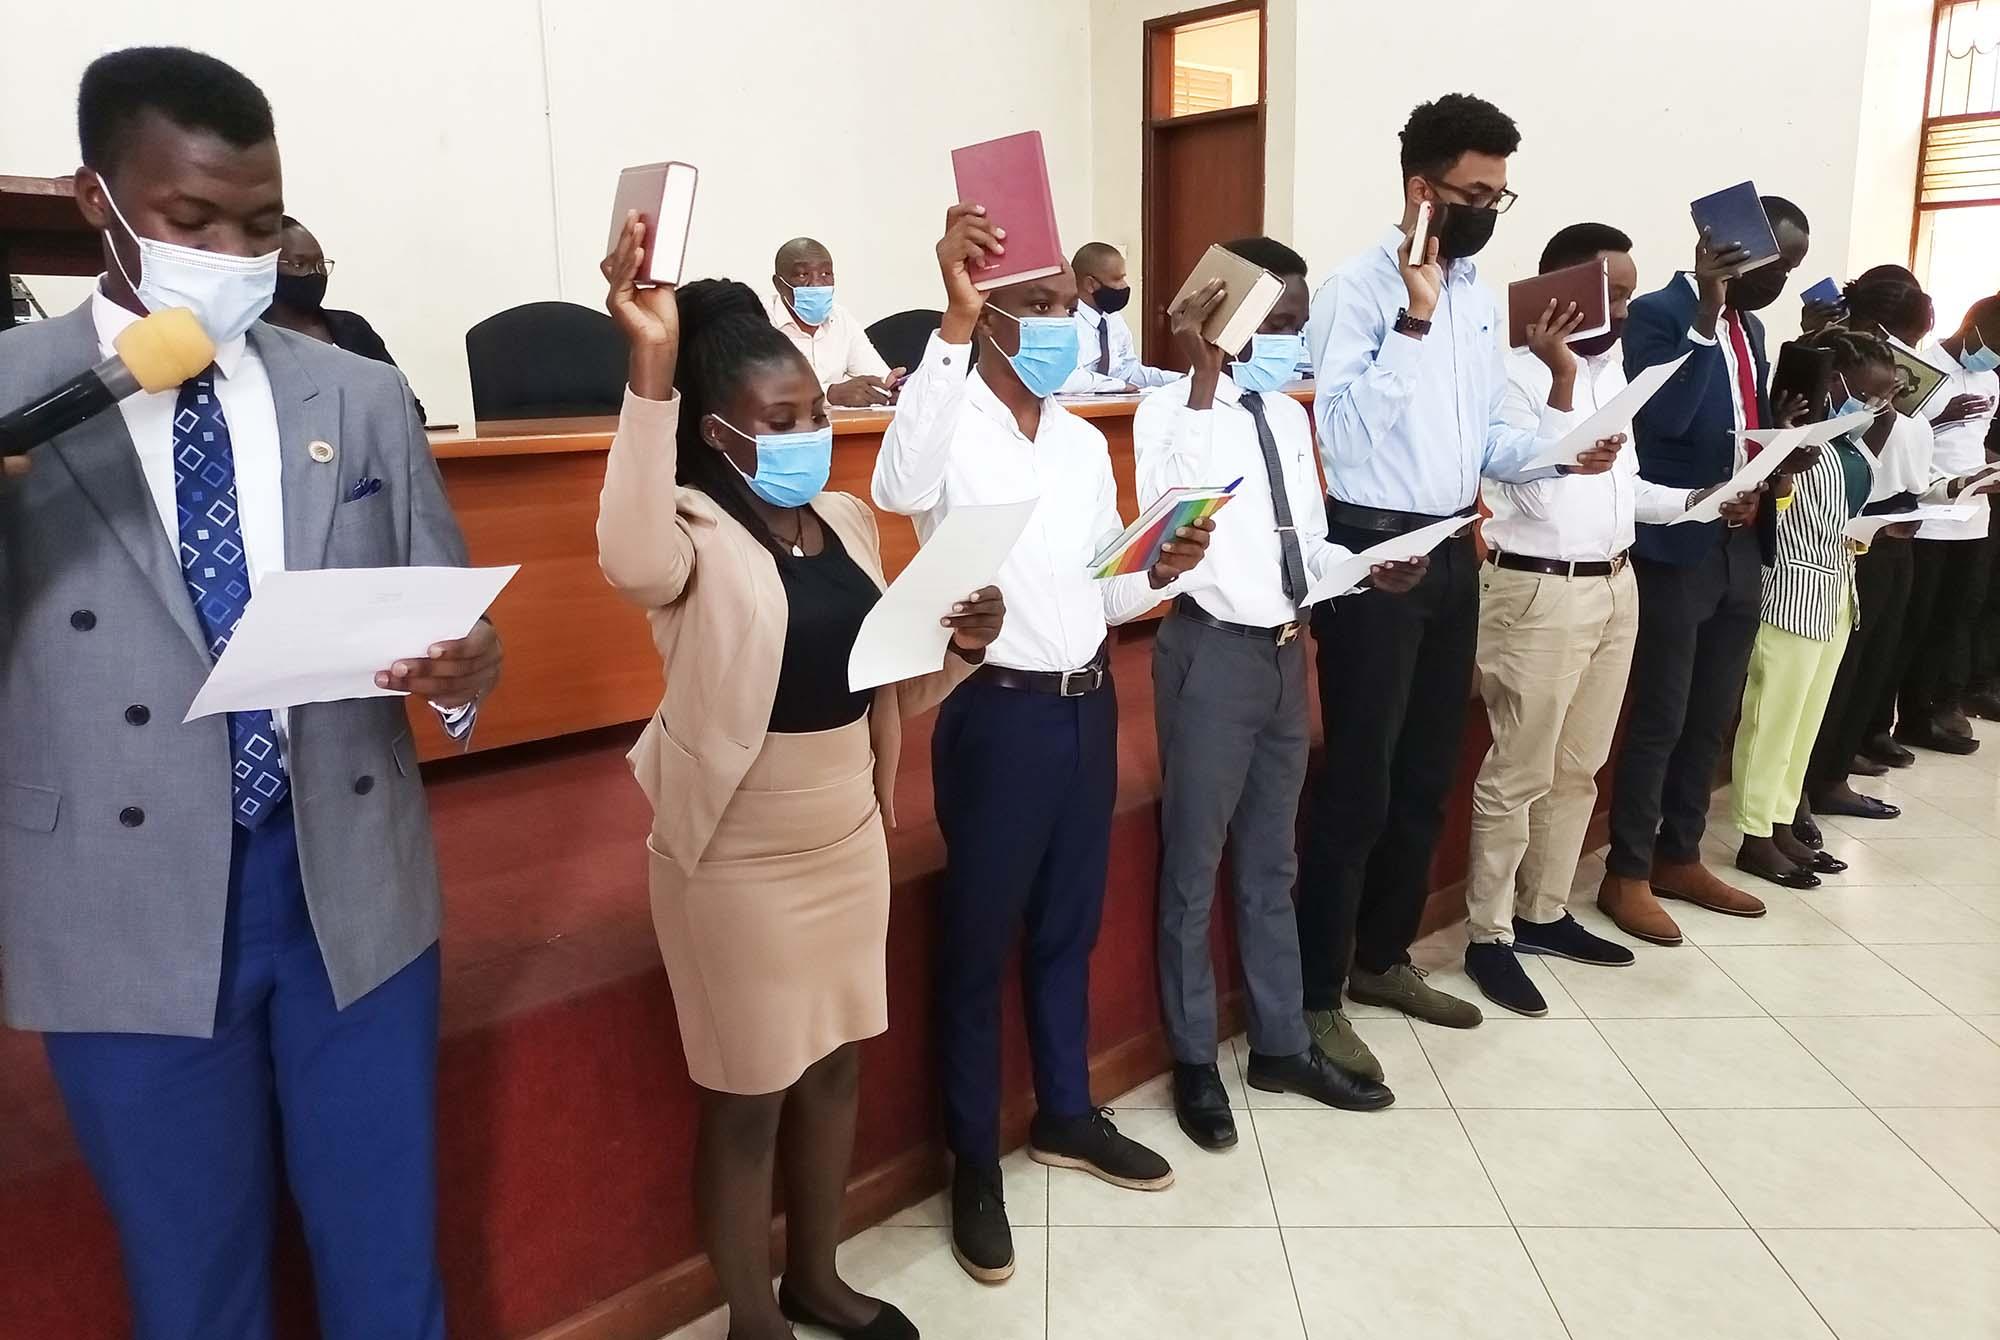 New Student Leaders sworn-in